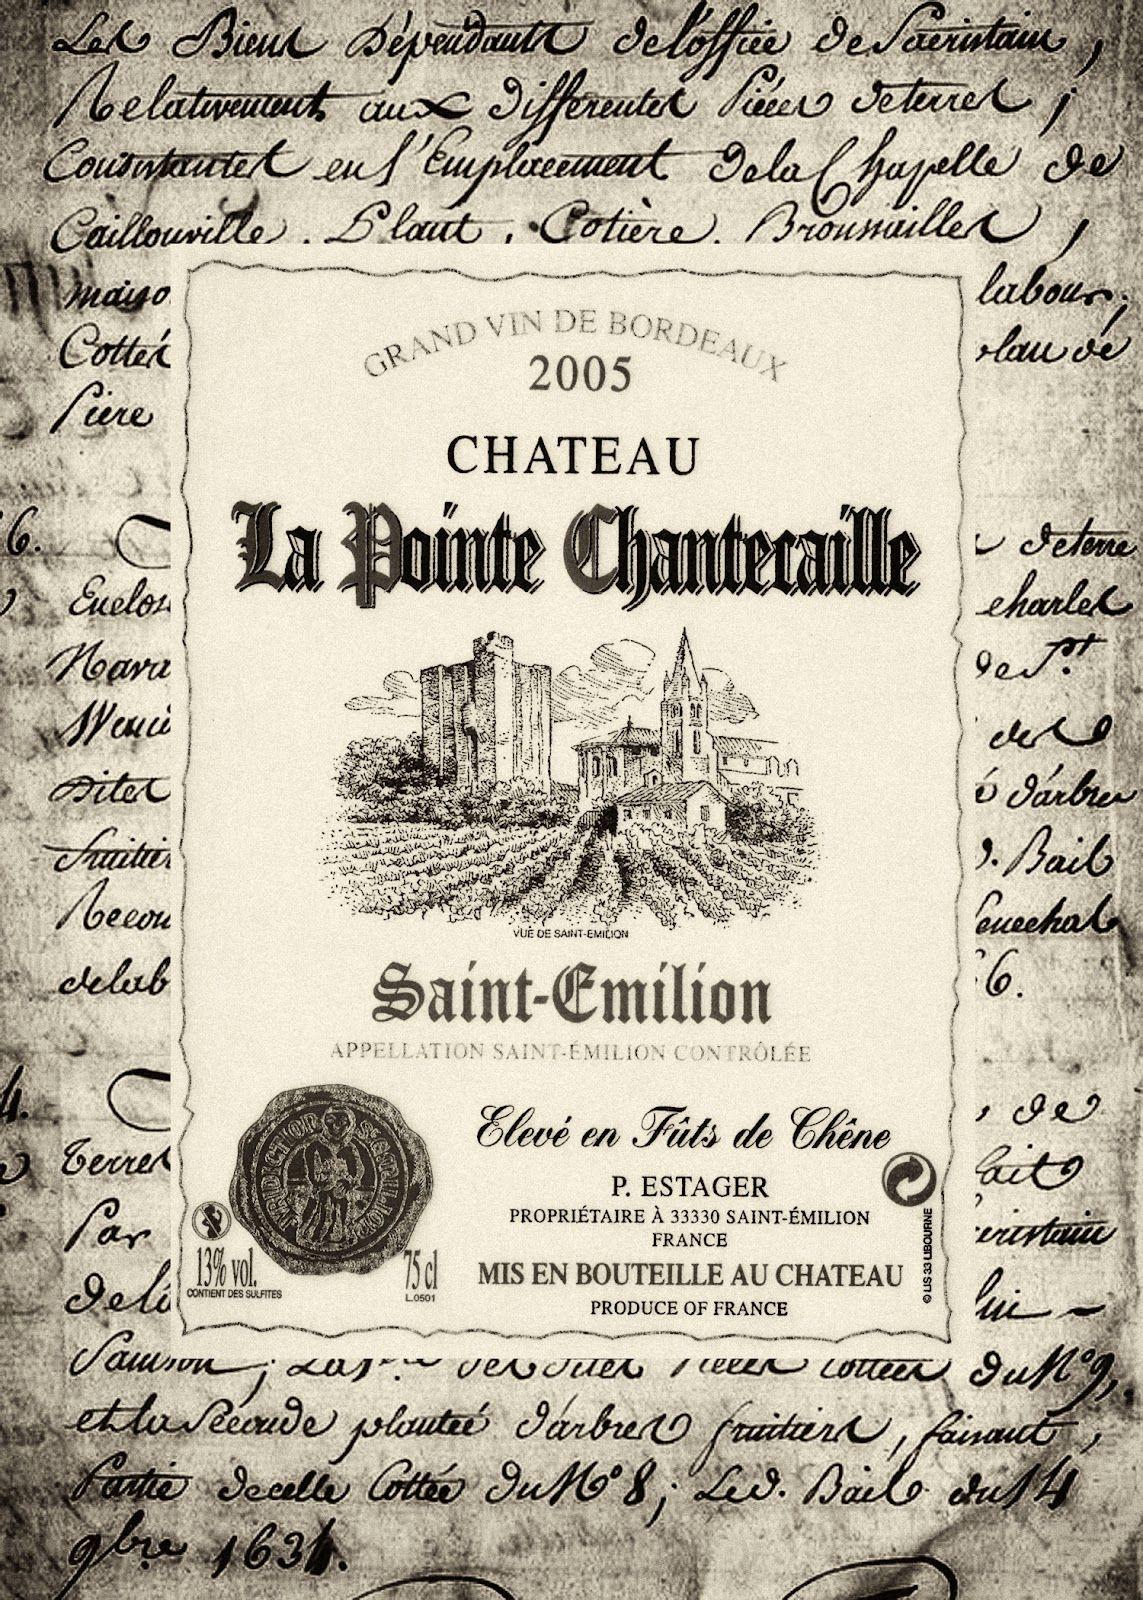 Vintage Wine Label Google Search Vintage Wine Label Vintage Wine Vintage Labels